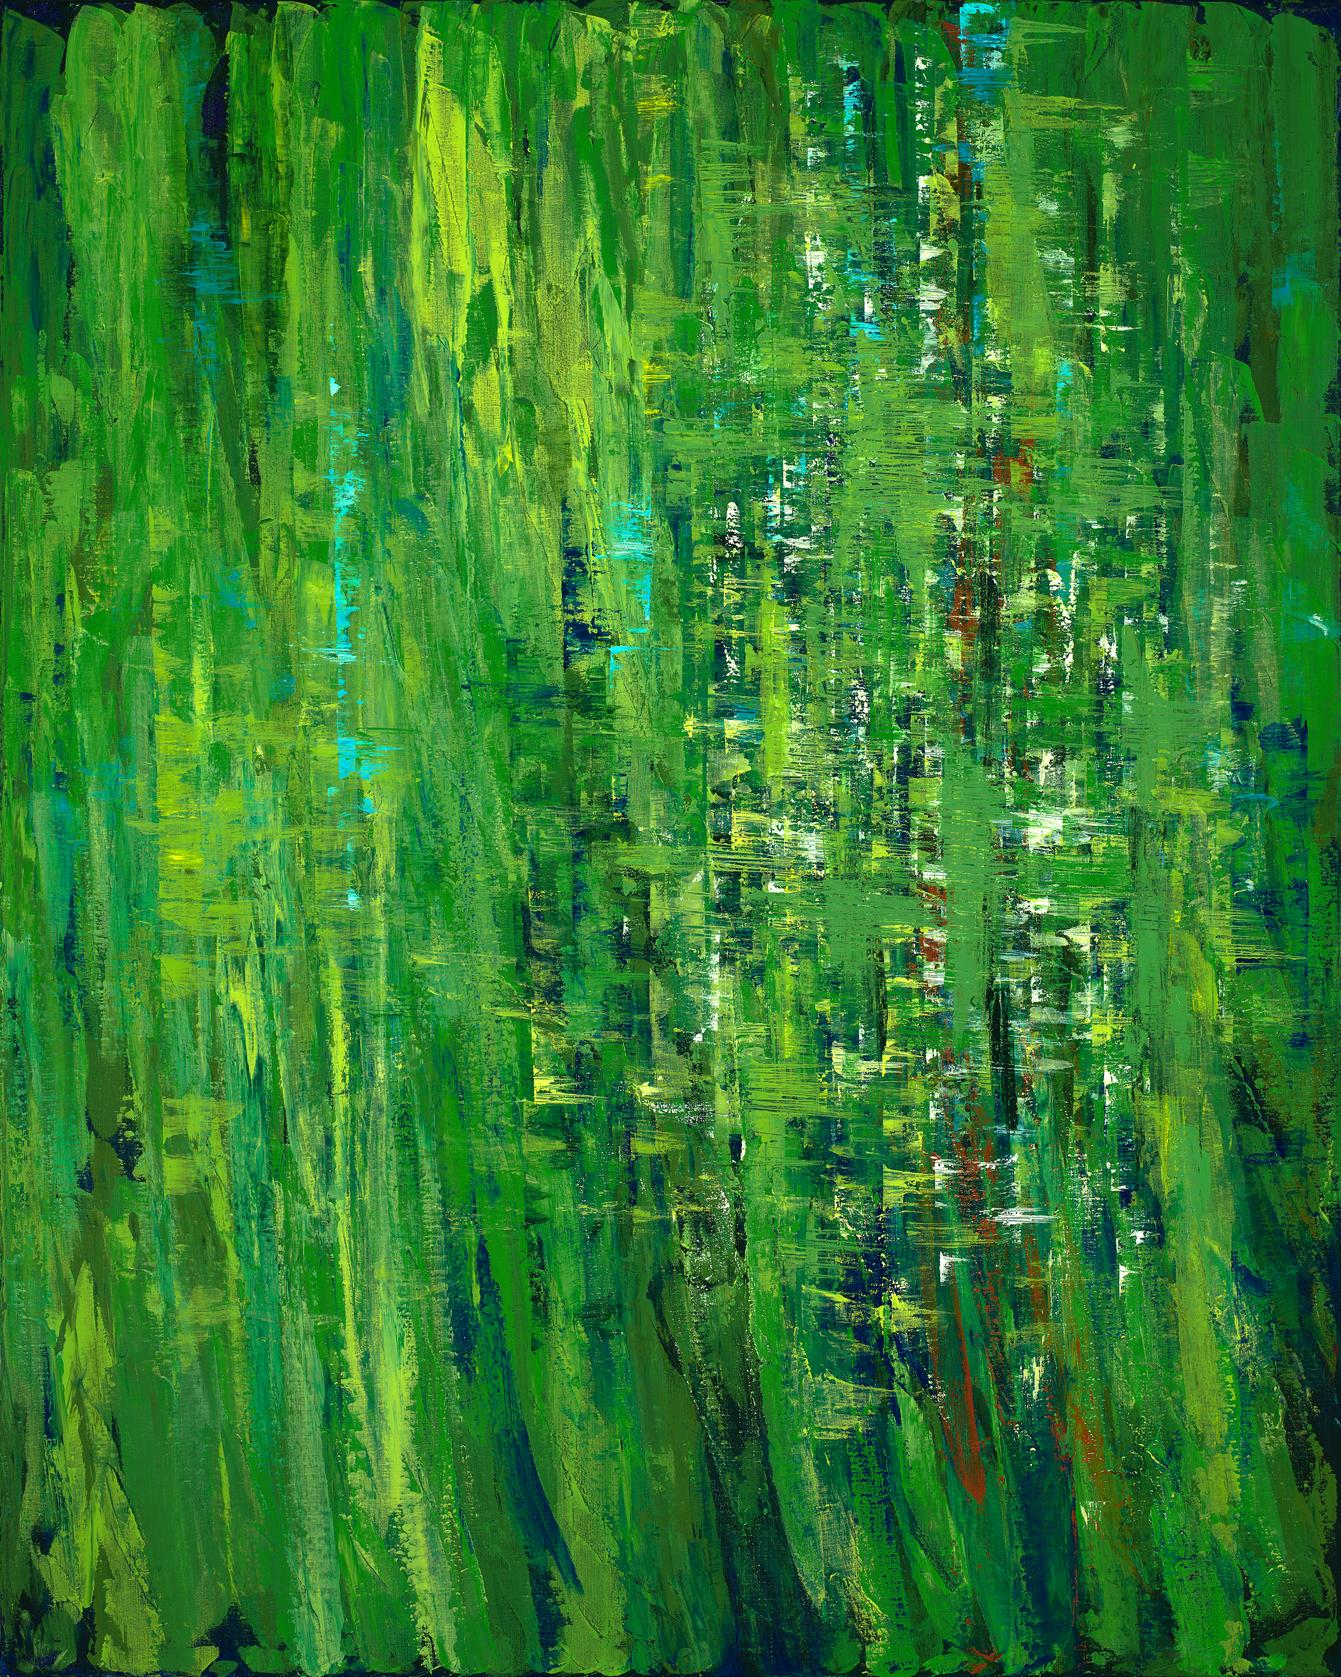 Emerald Spirit  48 x 60 in, 121.92 x 152.4 cm